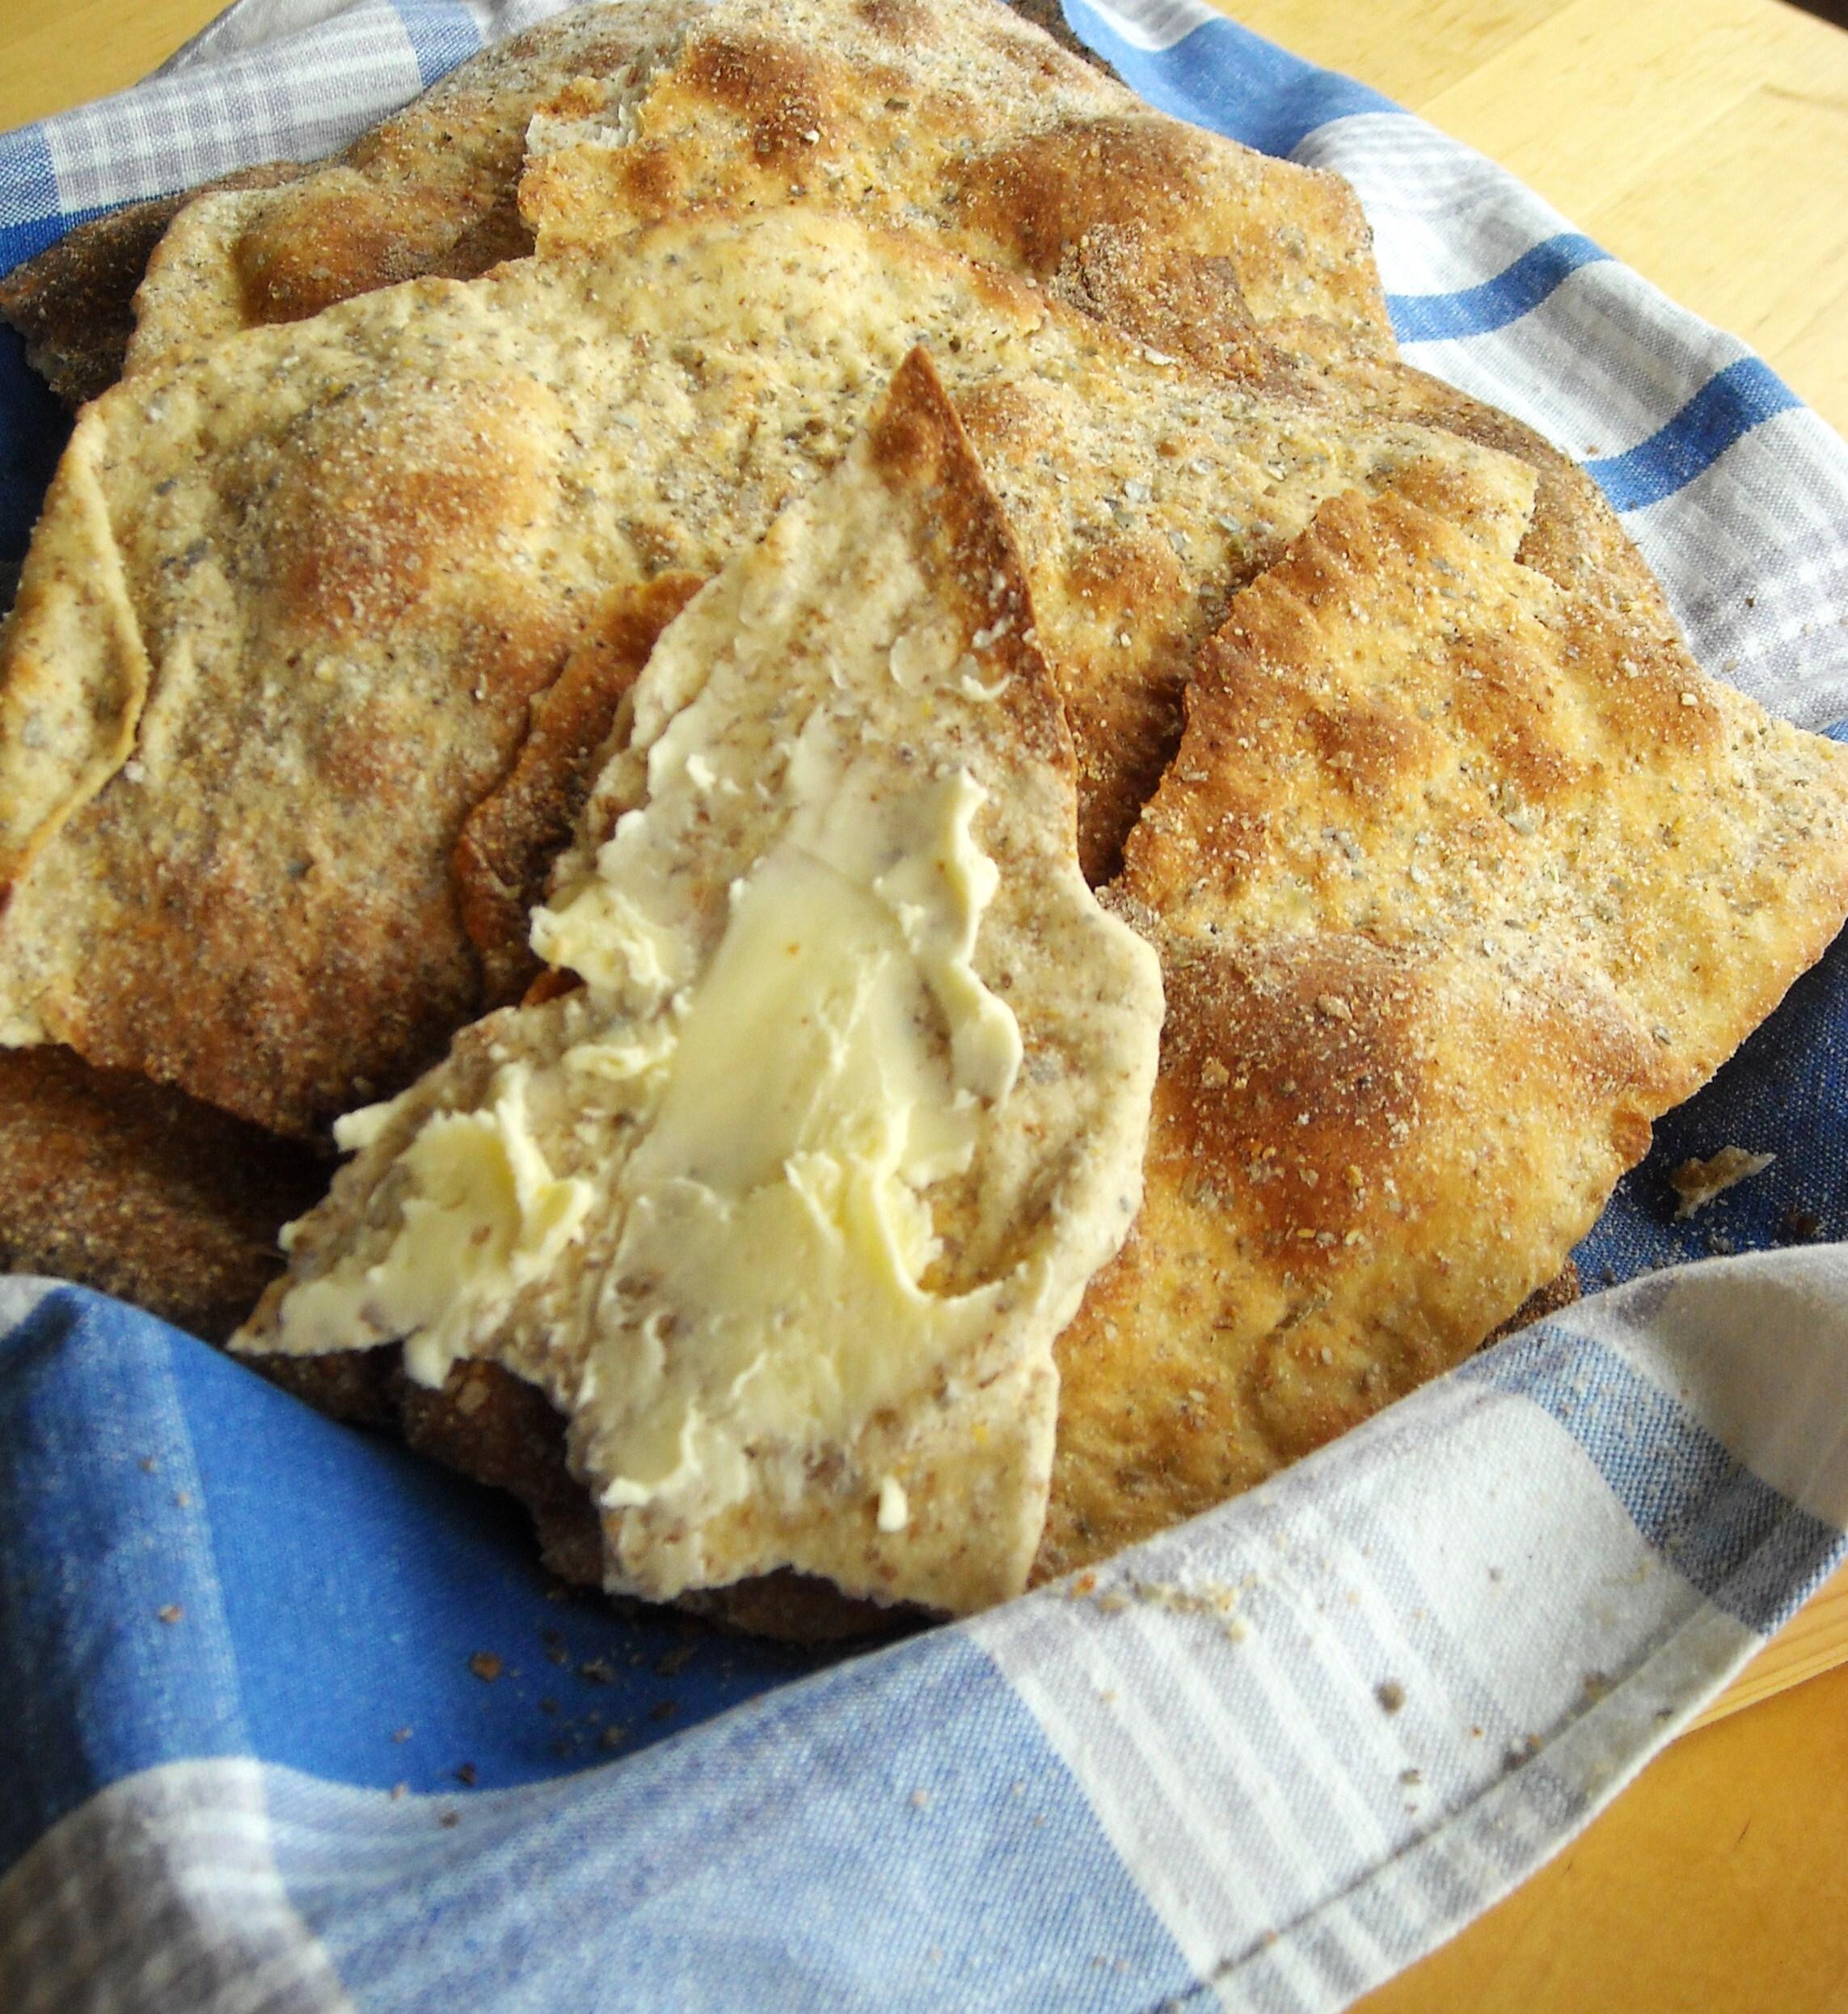 bröd utan jäsning i kall ugn